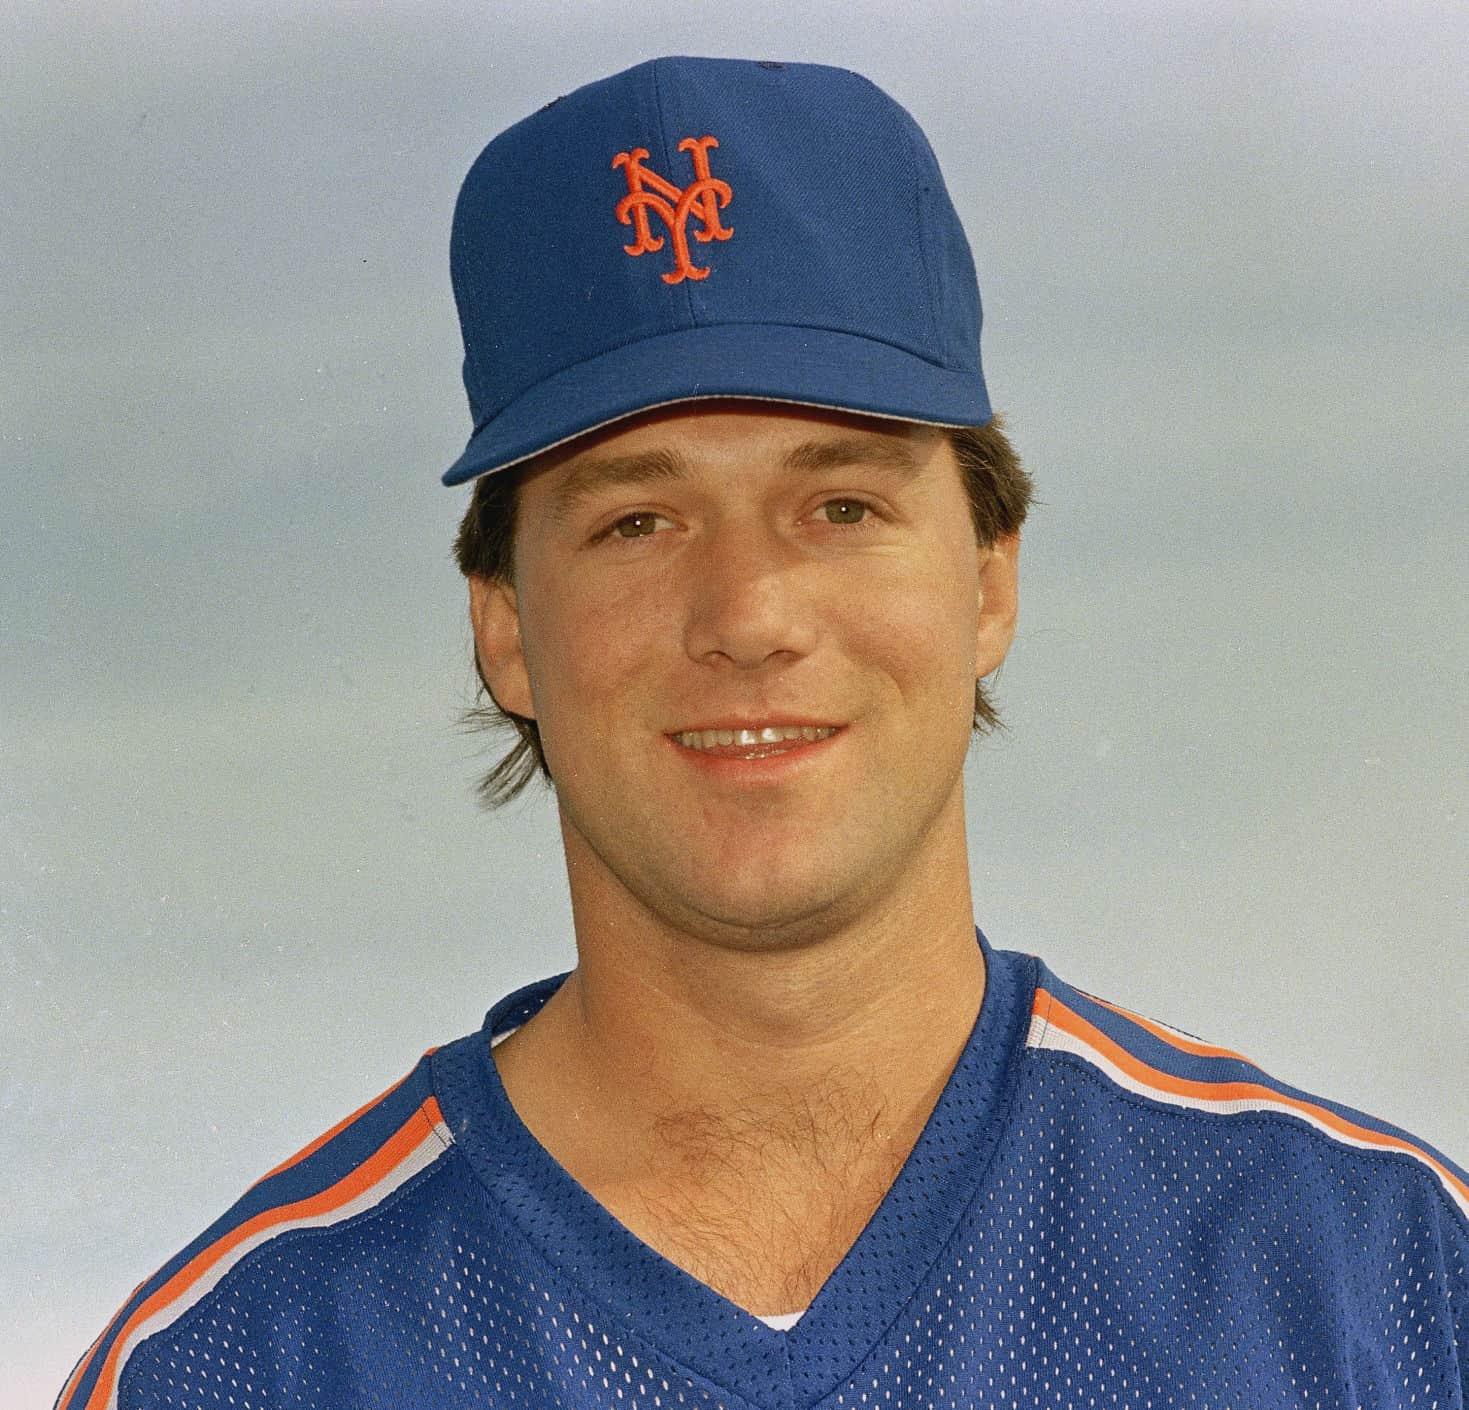 Roger McDowell Mets